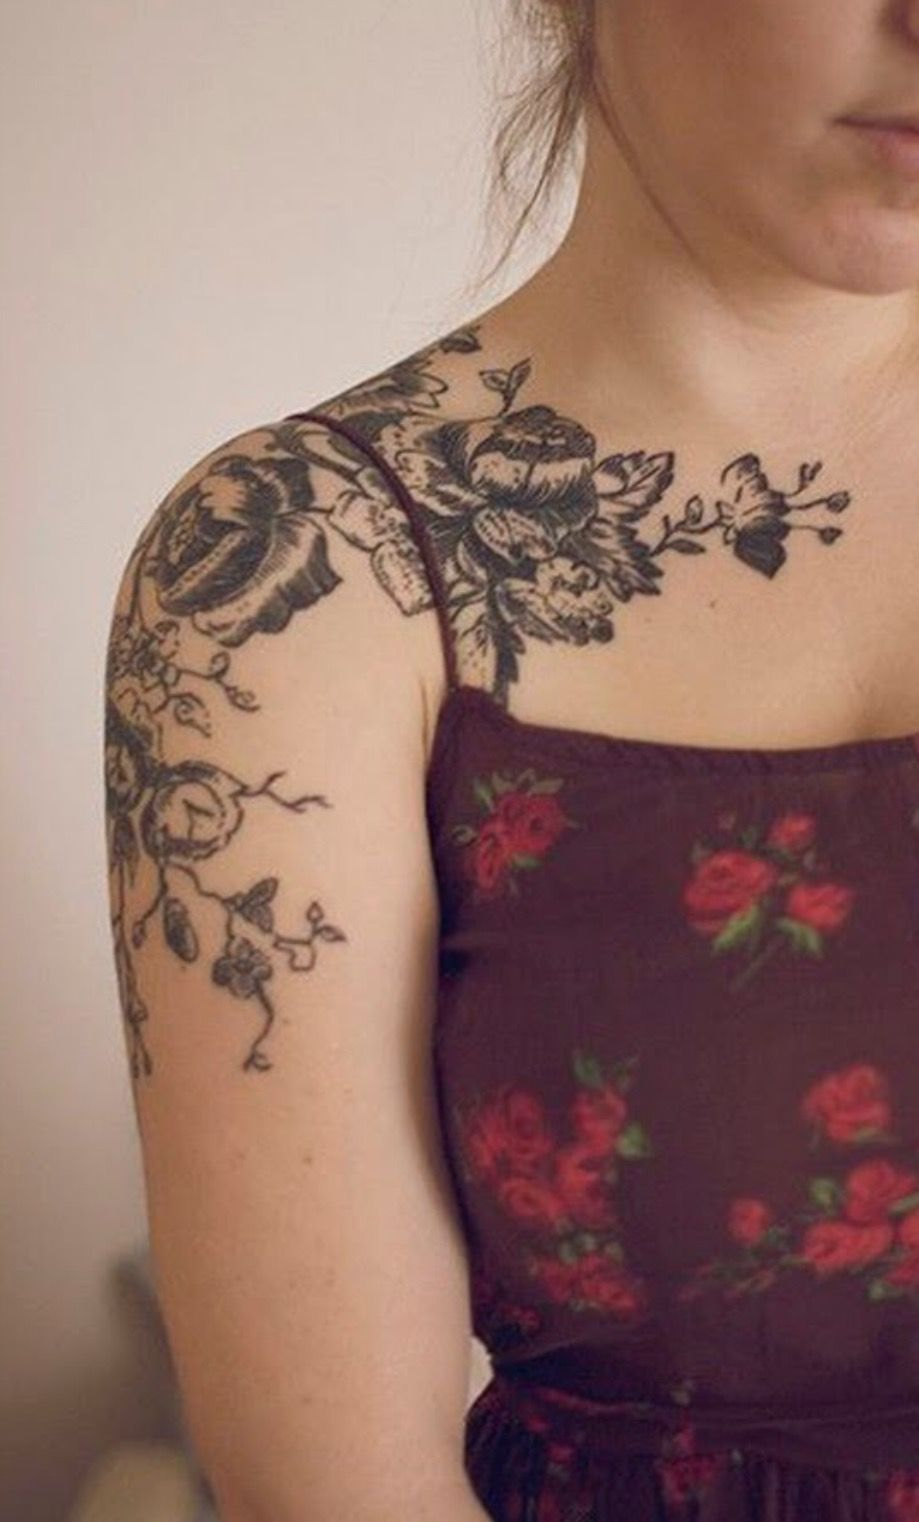 Pingl par kellsie sur tattoos pinterest - Tatouage epaule femme fleur ...